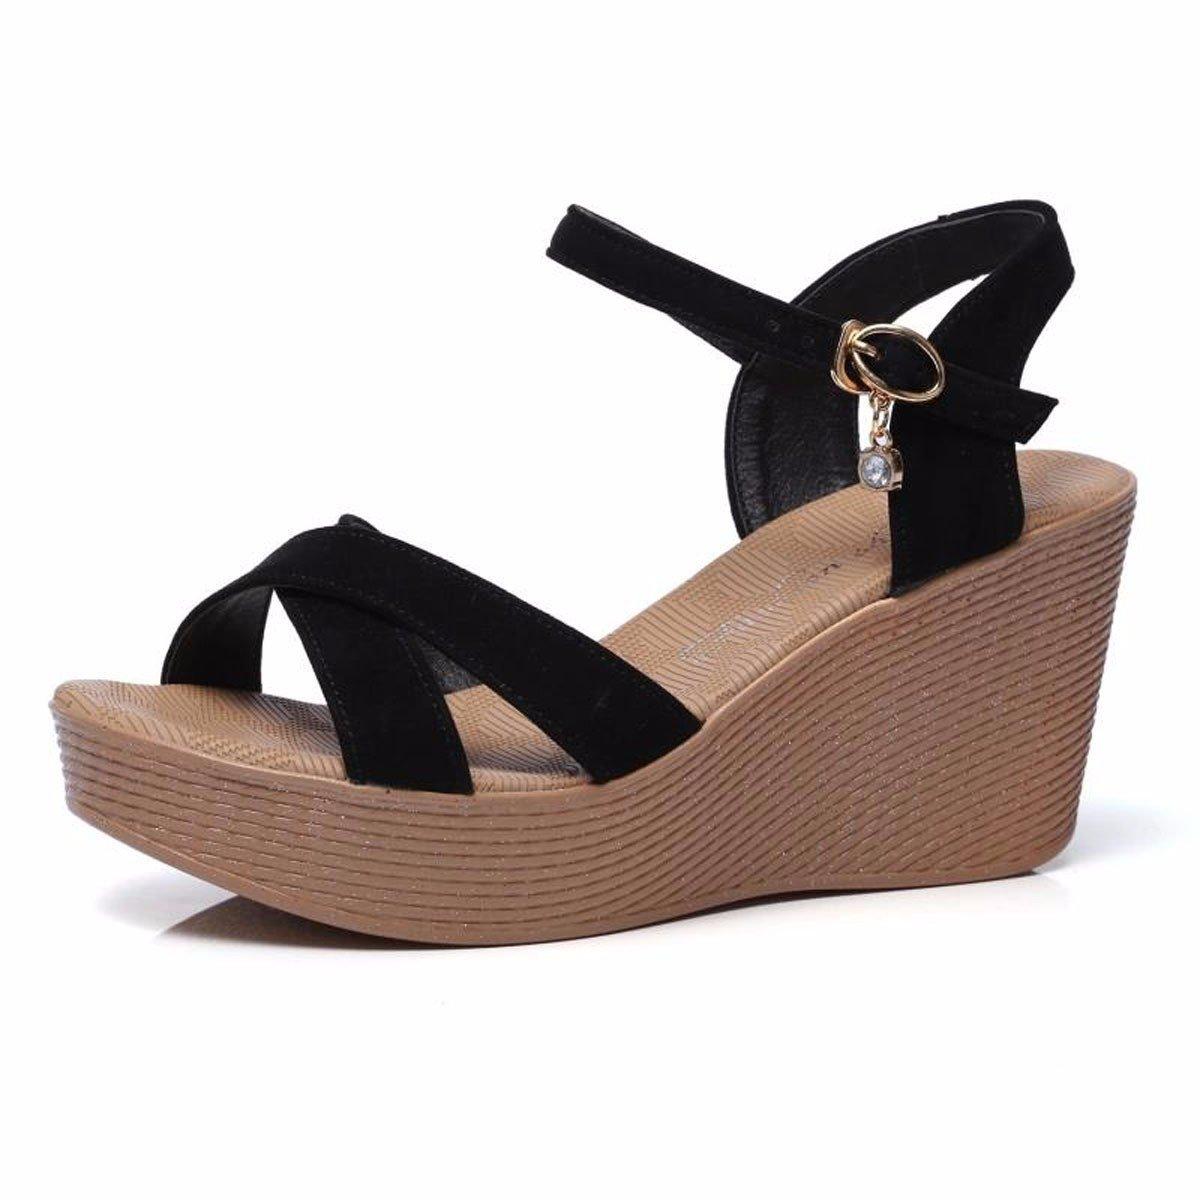 GTVERNH Sommer Damenschuhe Dicken Hintern Wasserdichte Plattform Steigung Ferse Sandalen Schnallen High Heels Sind Schuhe Rom Schuhe.